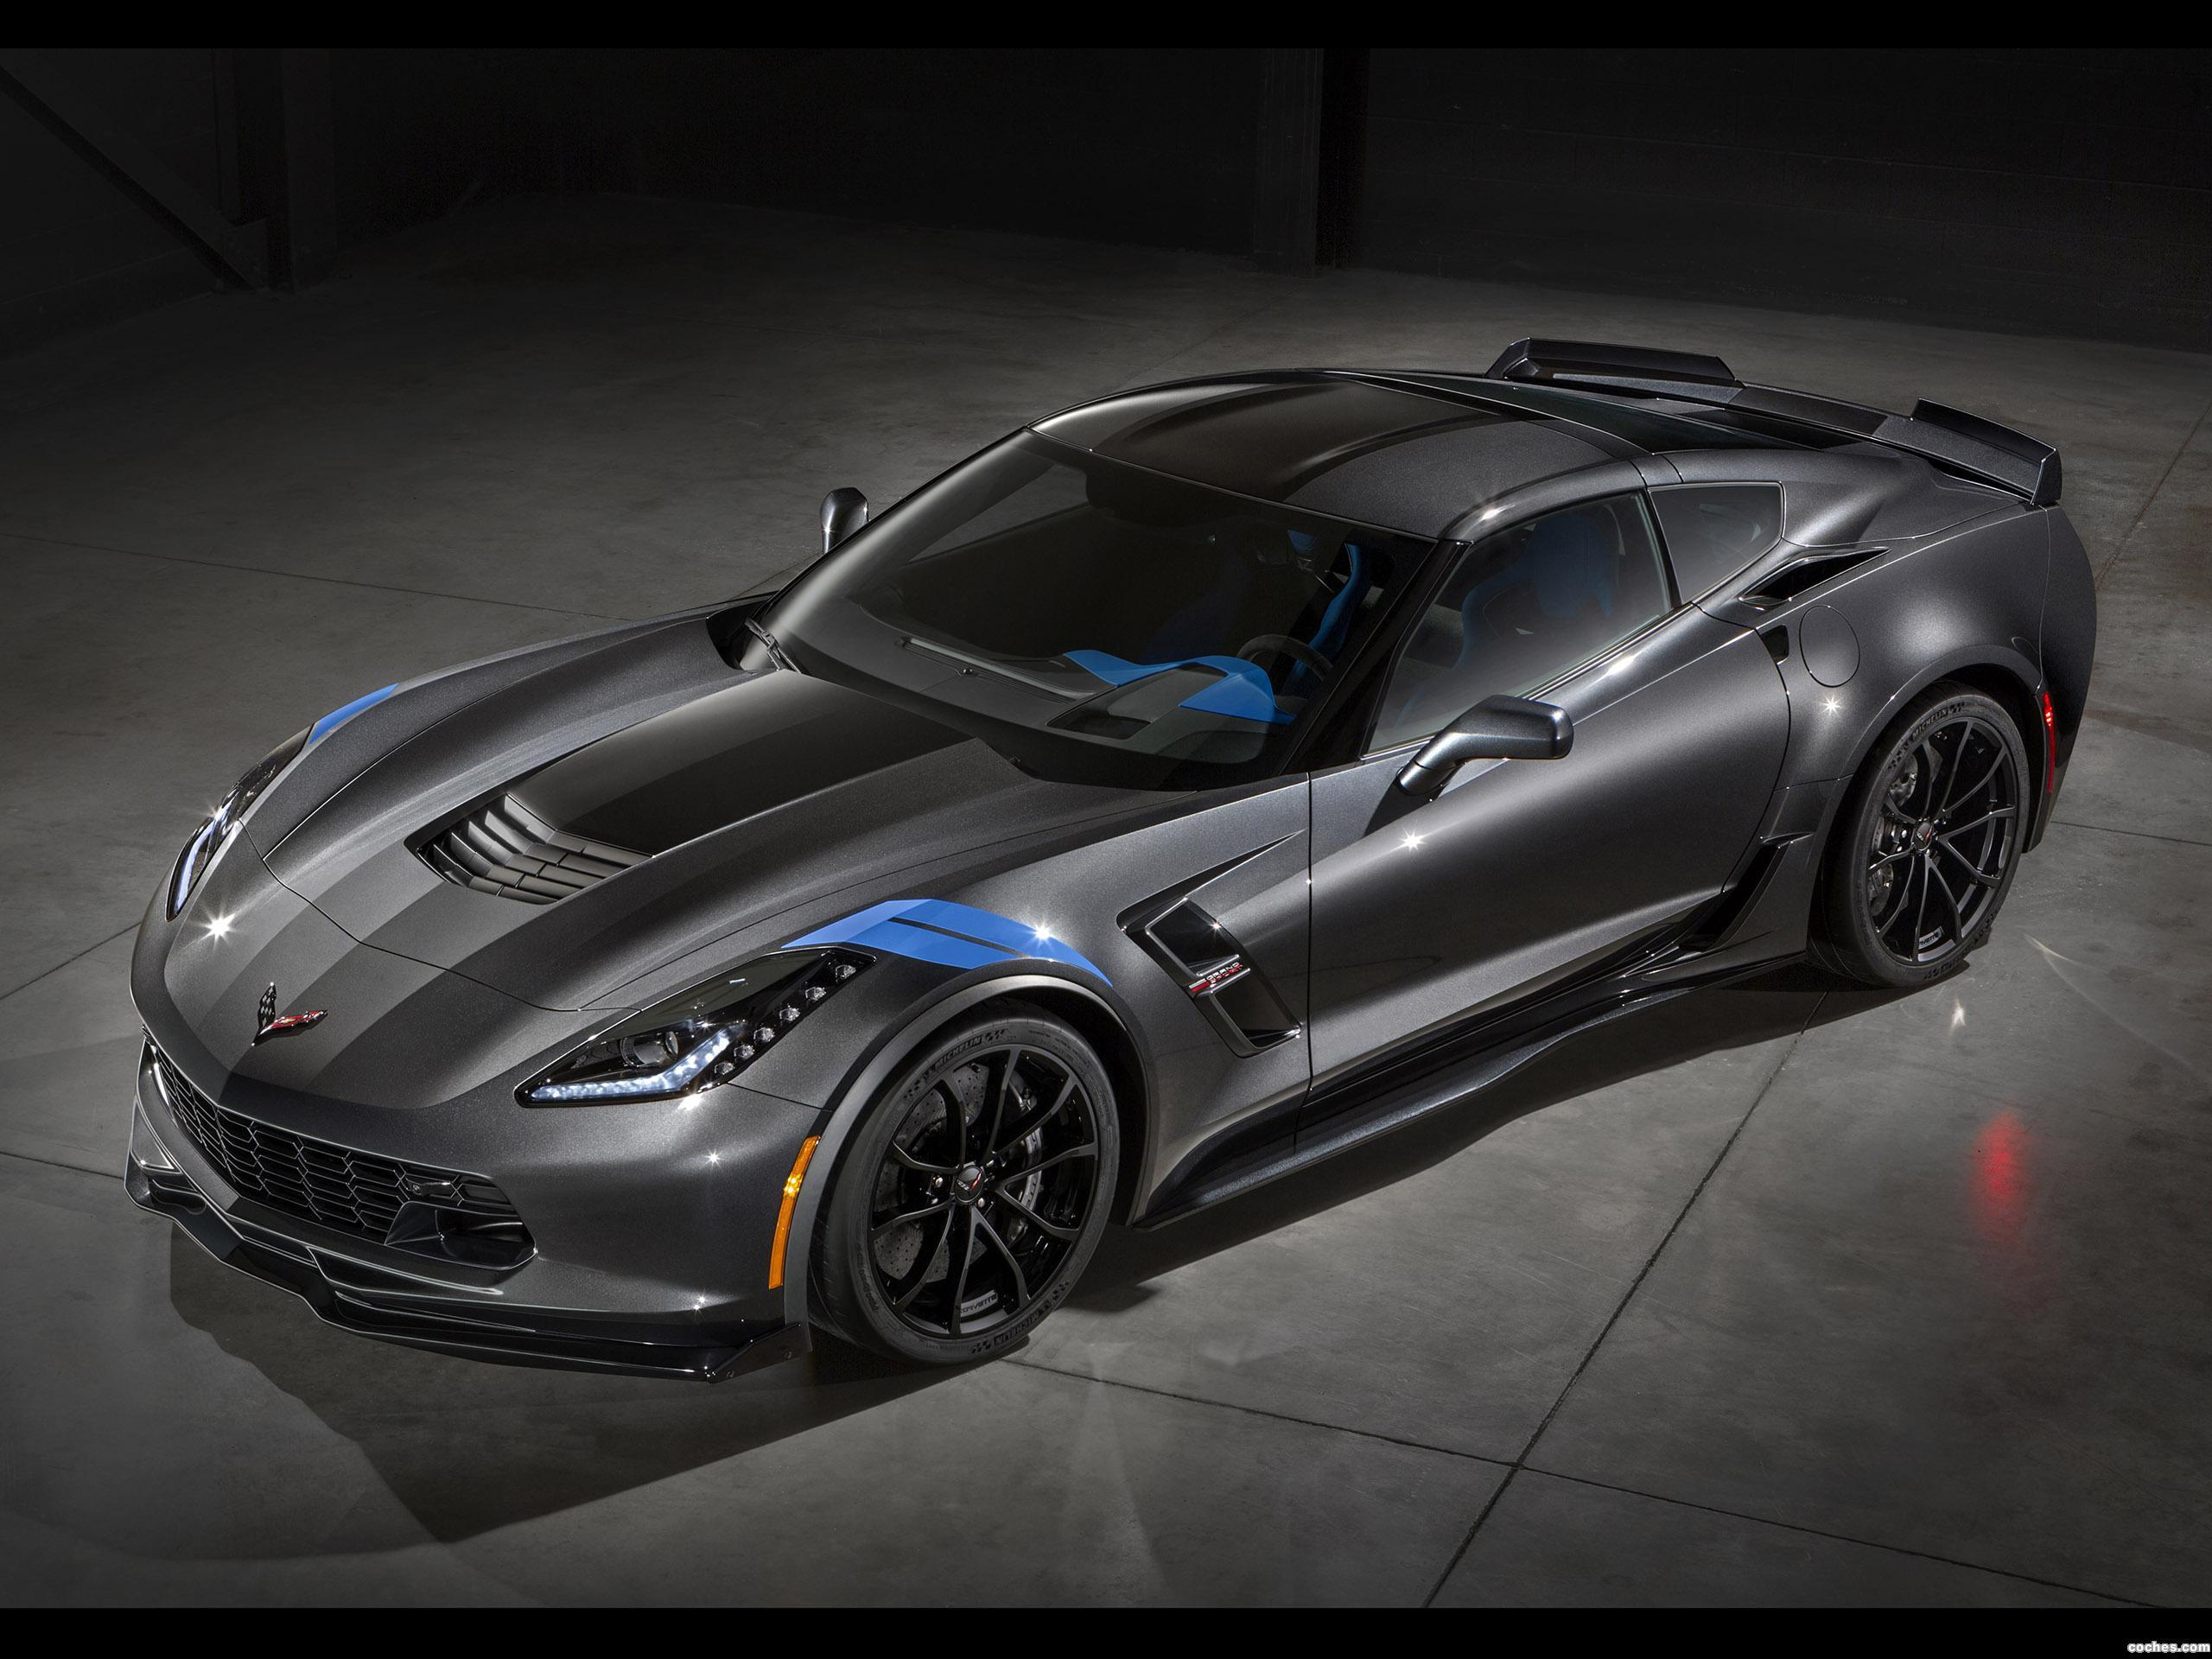 Foto 0 de Chevrolet Corvette C7 Grand Sport 2016